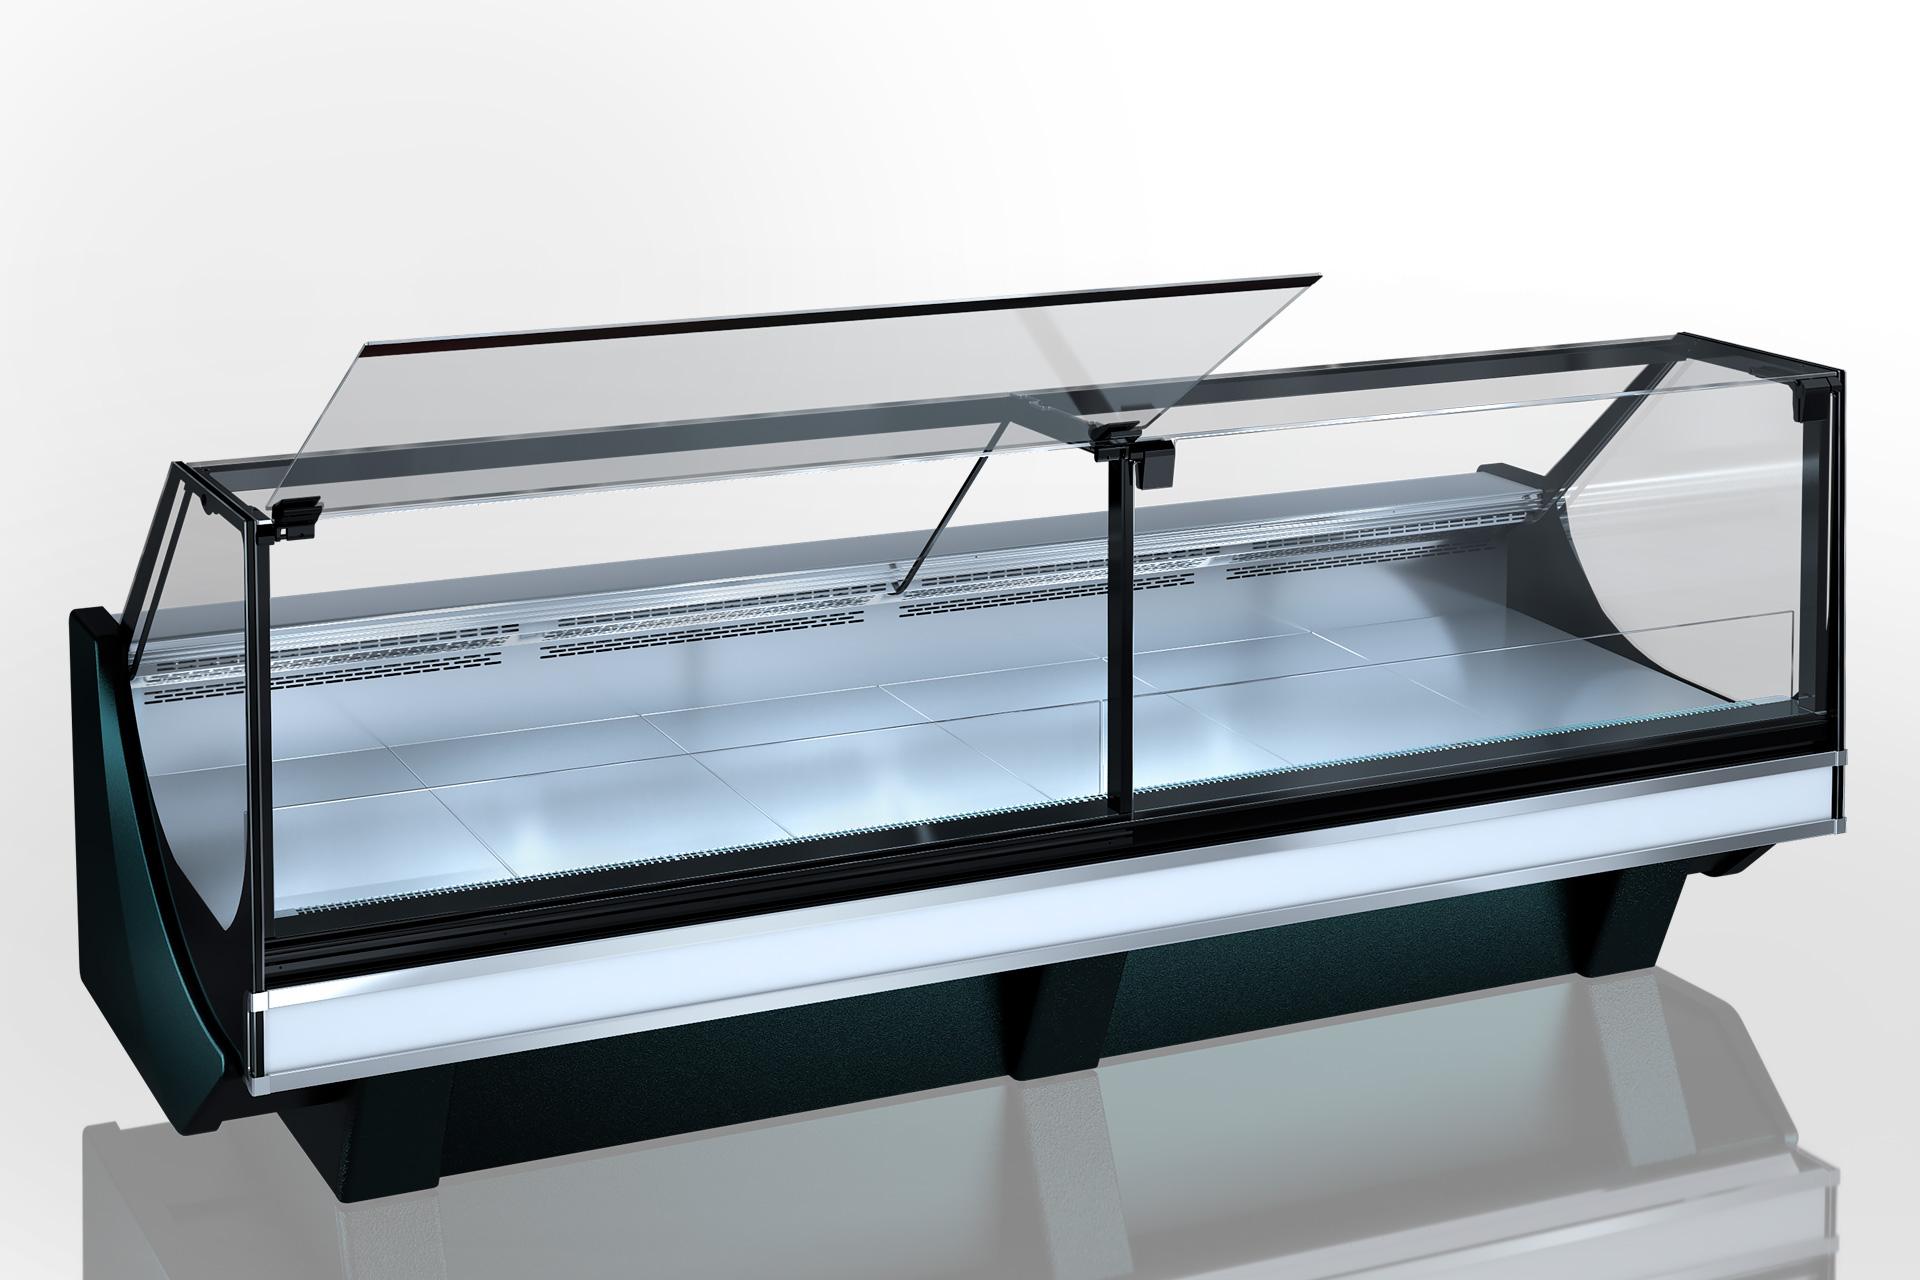 Refrigerated counters Missouri сold diamond MC 126 deli PS 130-DBM/DLM